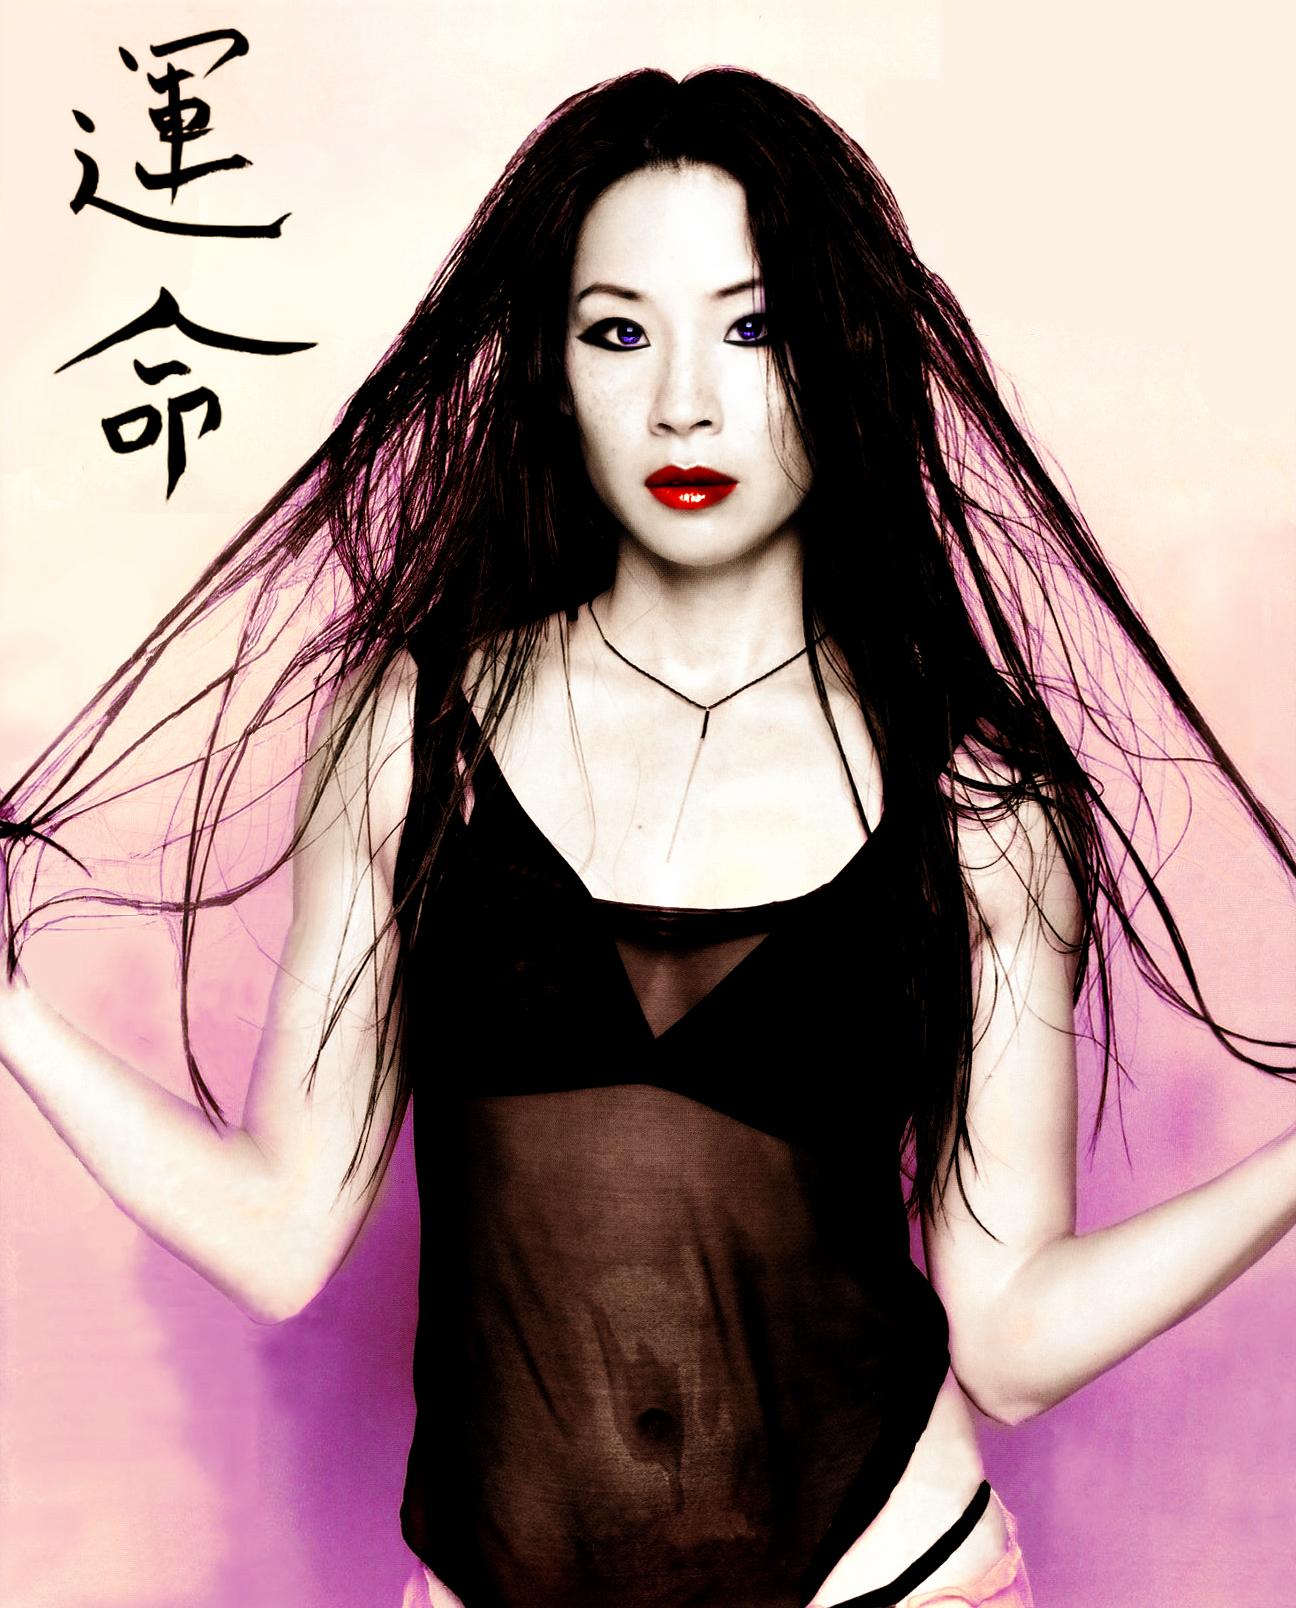 Lucy Liu style Geisha by ChiccoArt Lucy Liu style Geisha by ChiccoArt